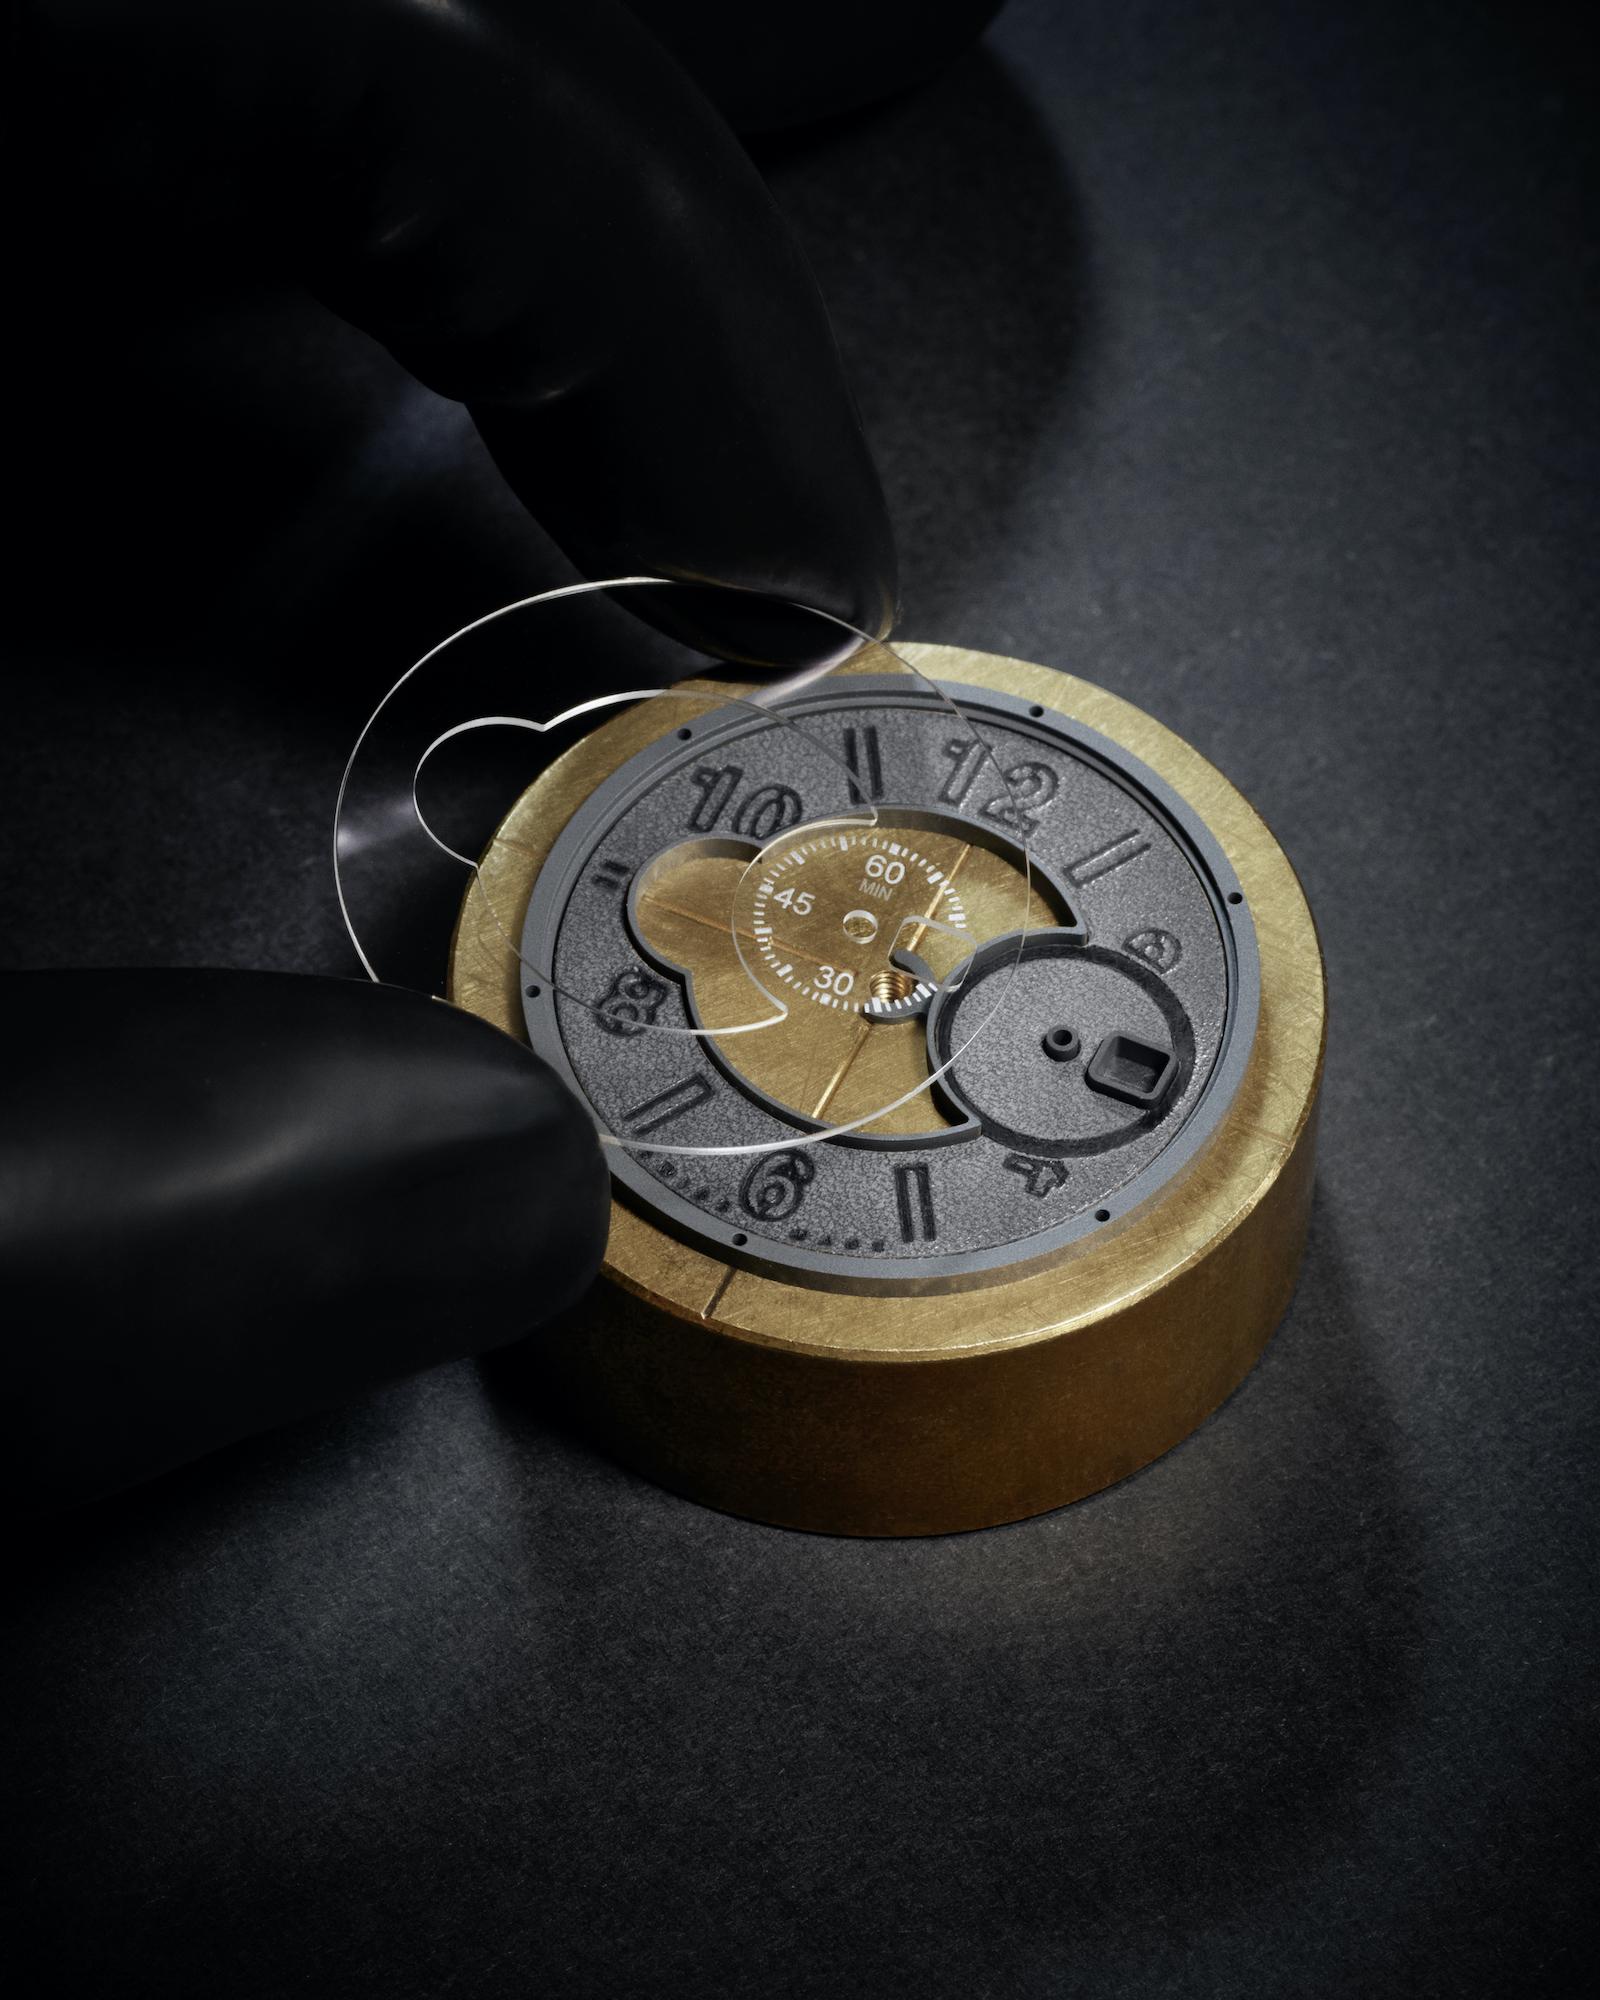 Hublot Big Bang Unico Berluti Aluminio 421.NX.0500.VR.BER21 Savoir Faire Cristal